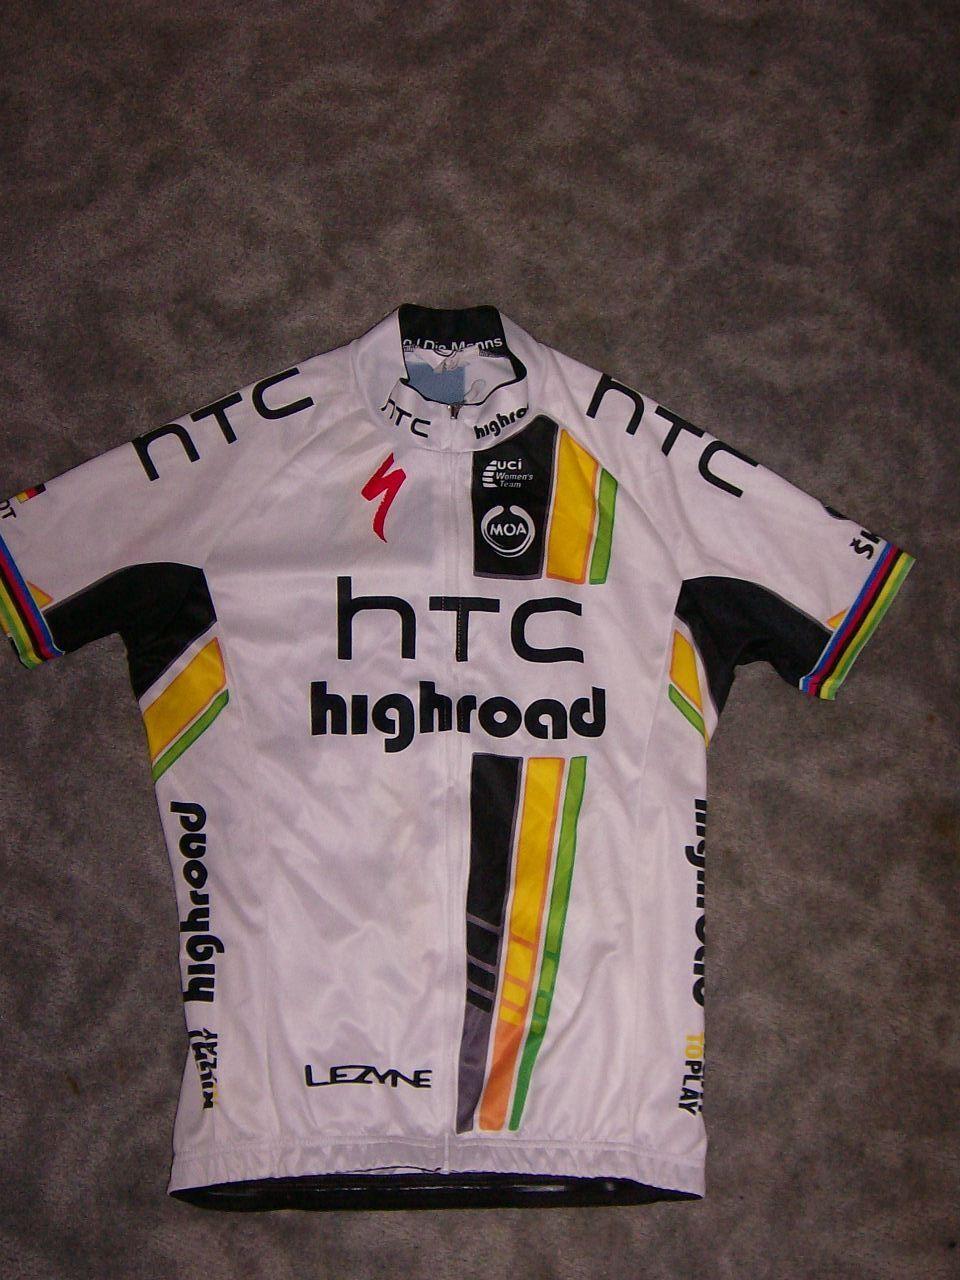 EX World Champ Team HTC Highroad Specialized Jersey / Trikot